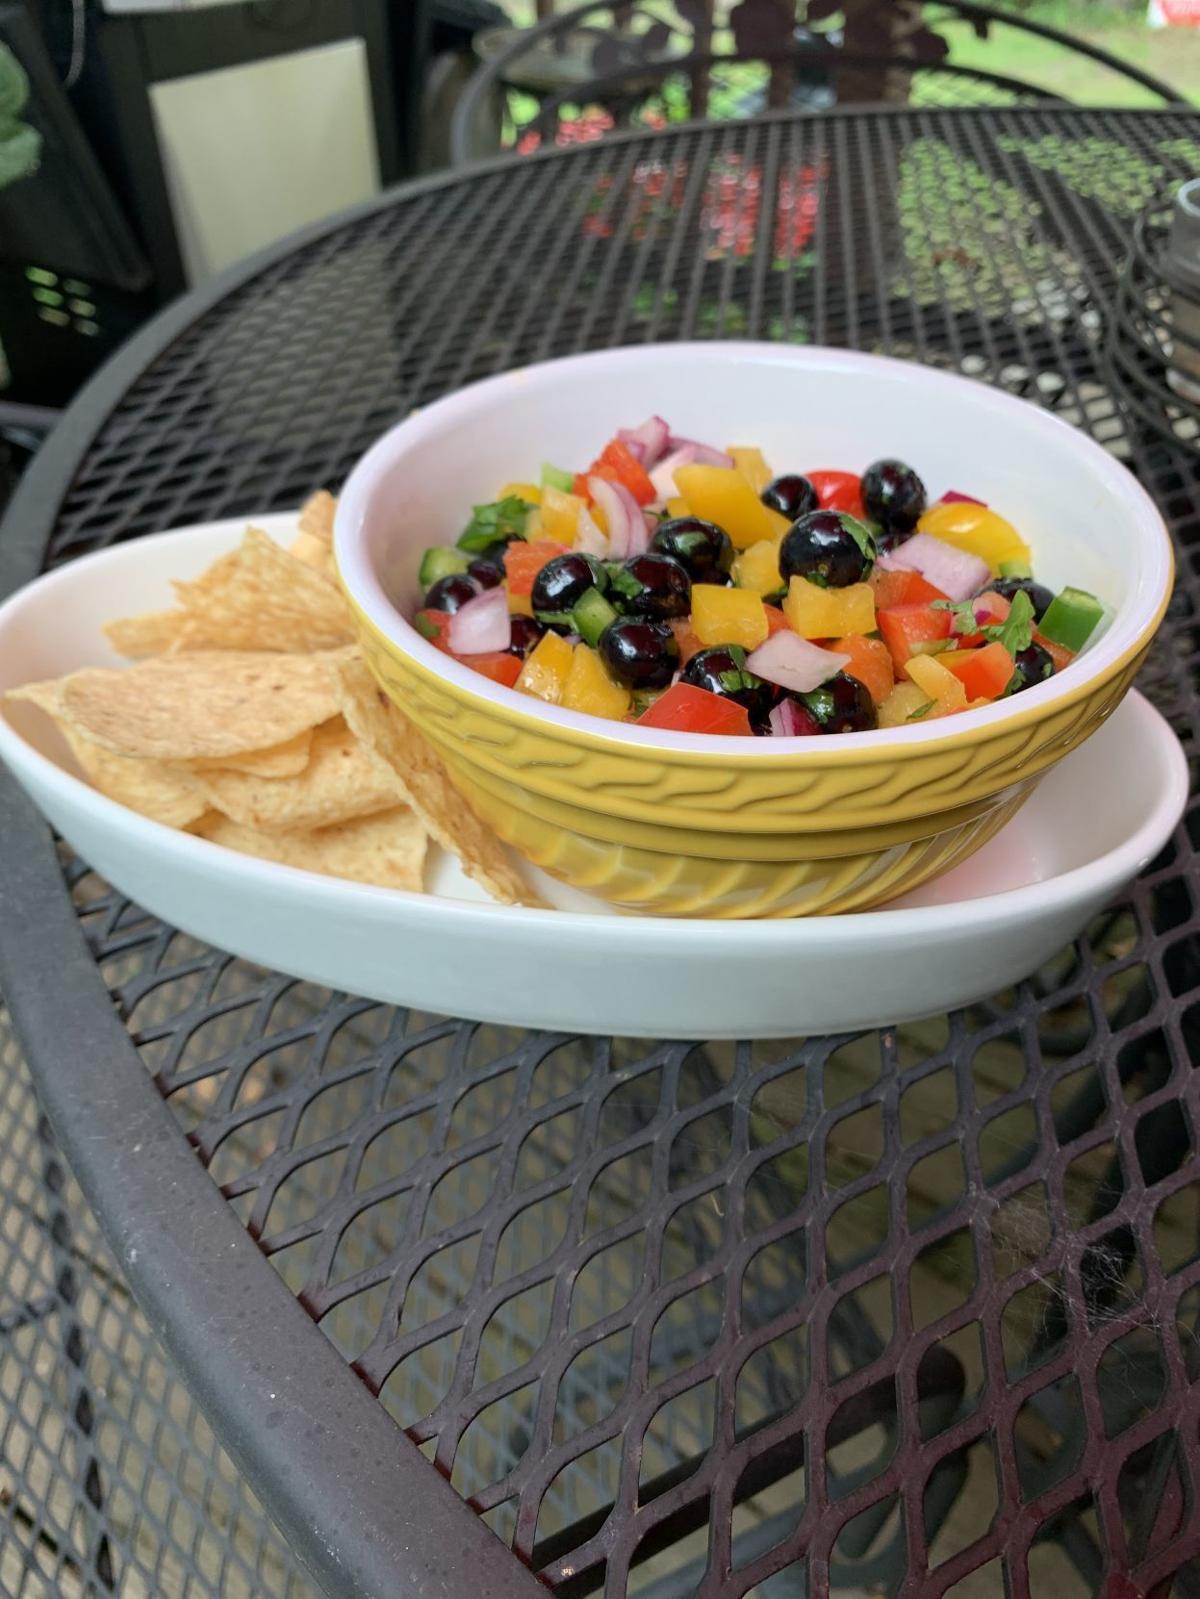 djr-2019-08-28-food-salsap2